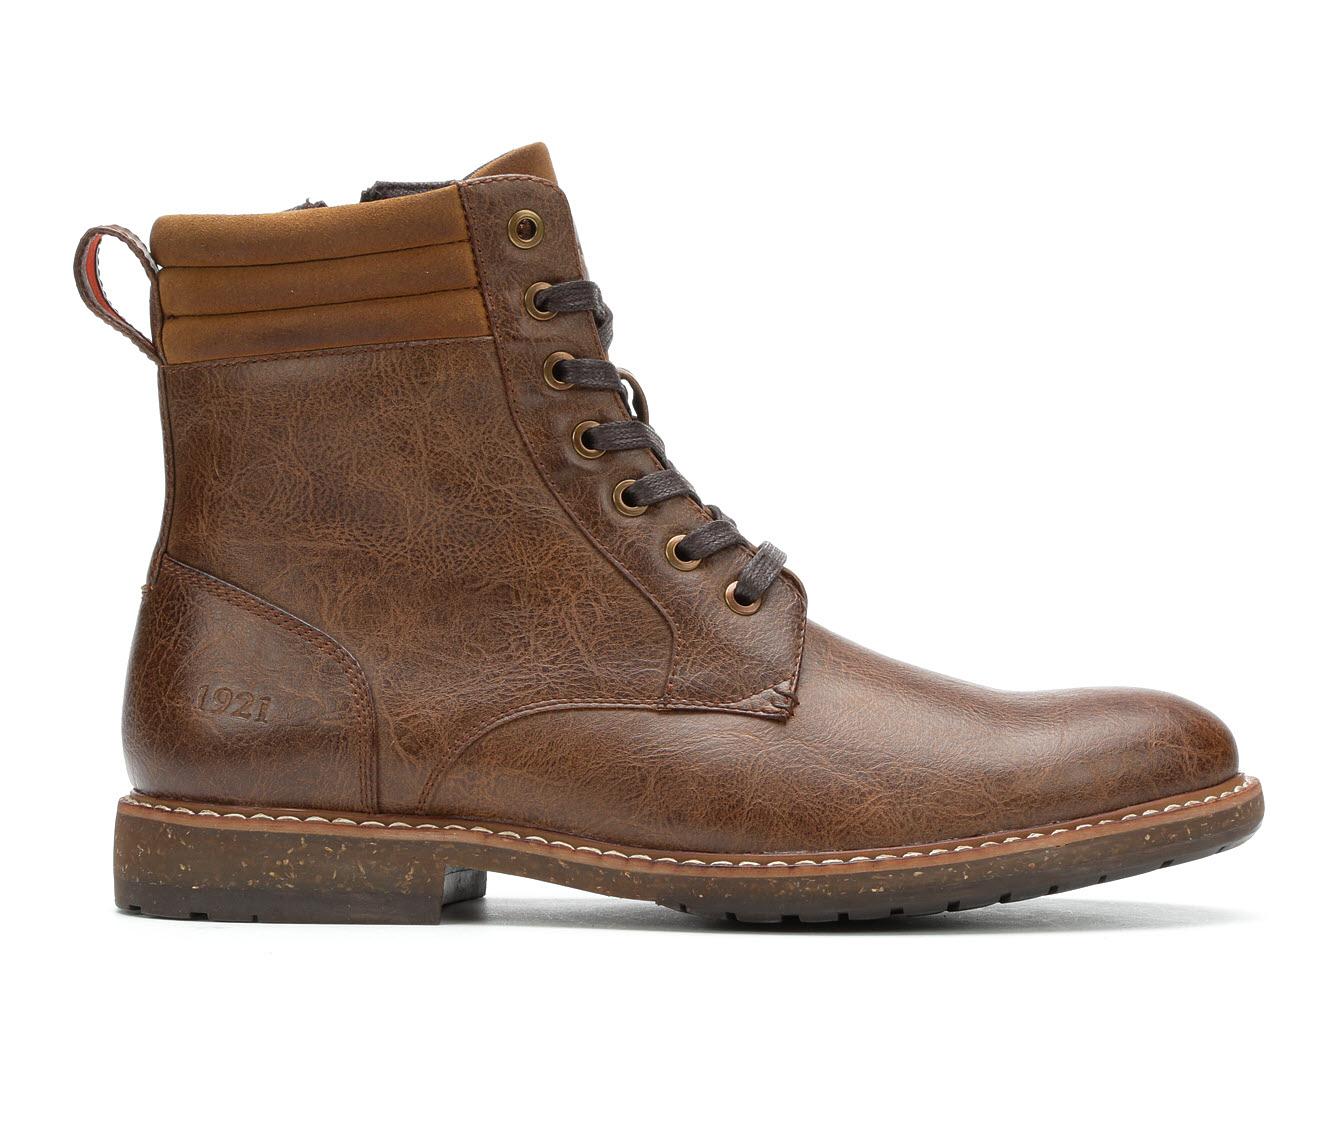 Freeman Jackson Men's Boots (Brown Faux Leather)